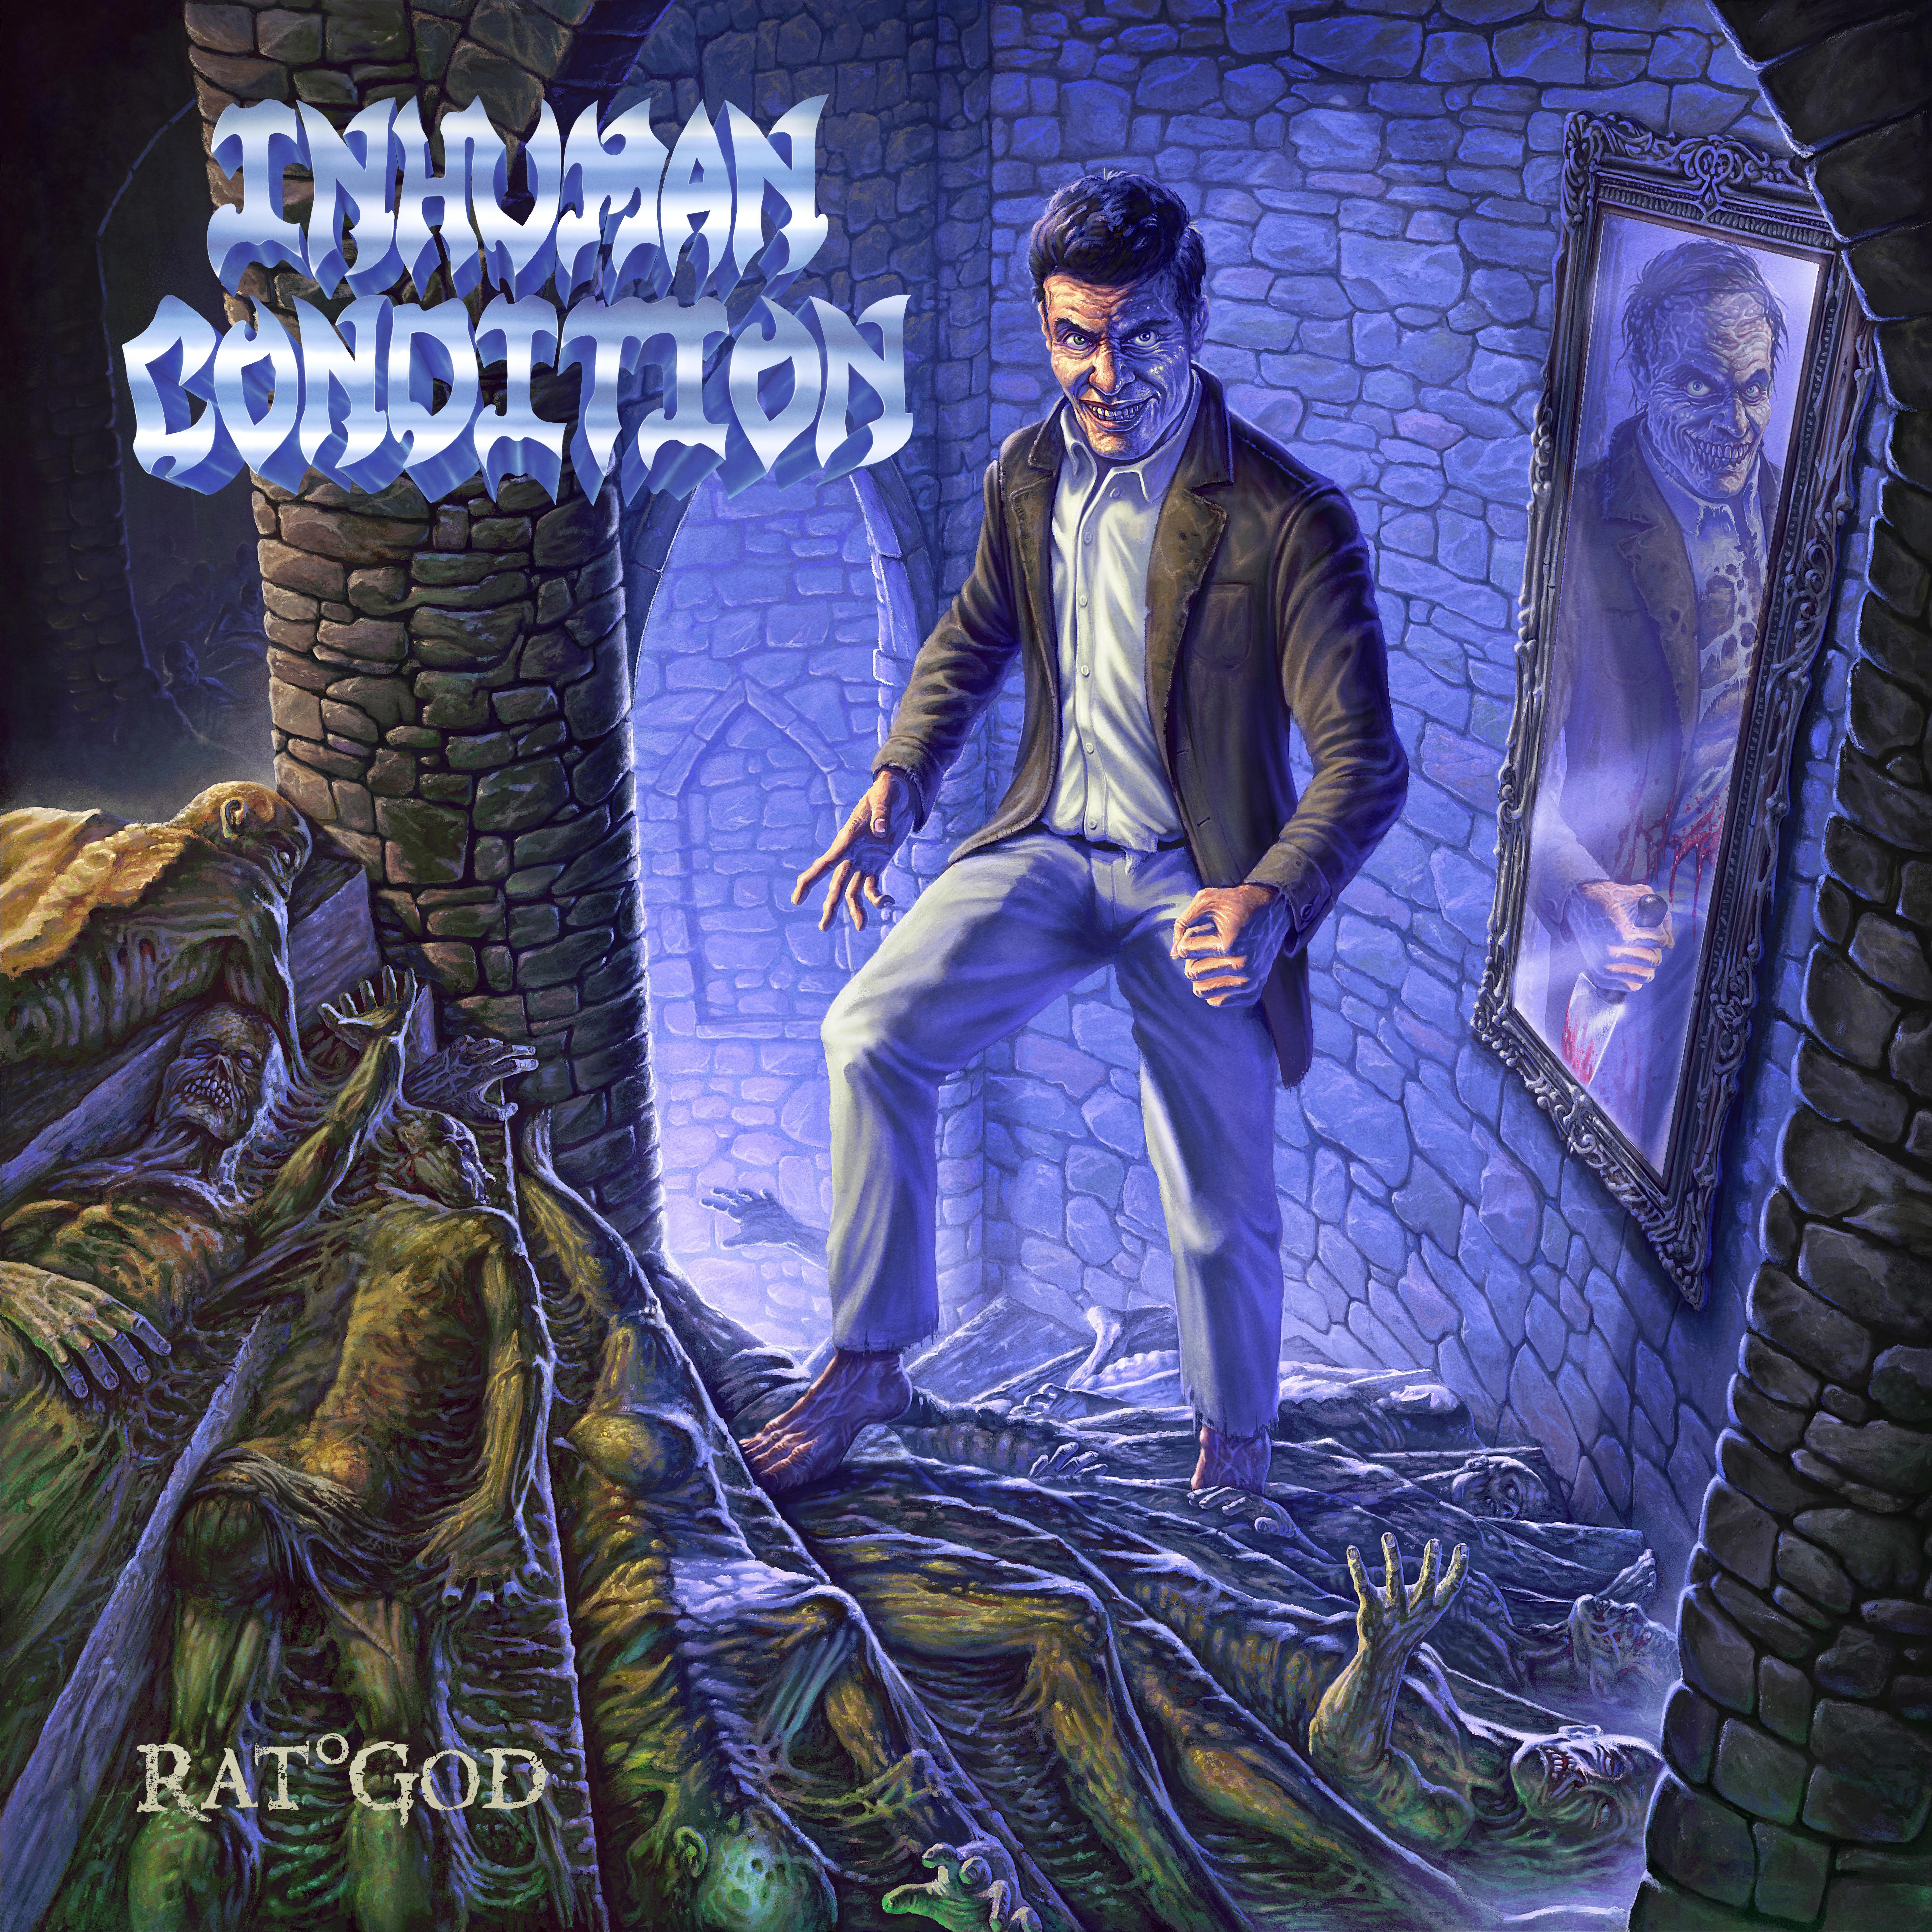 Inhuman Condition - Rat God